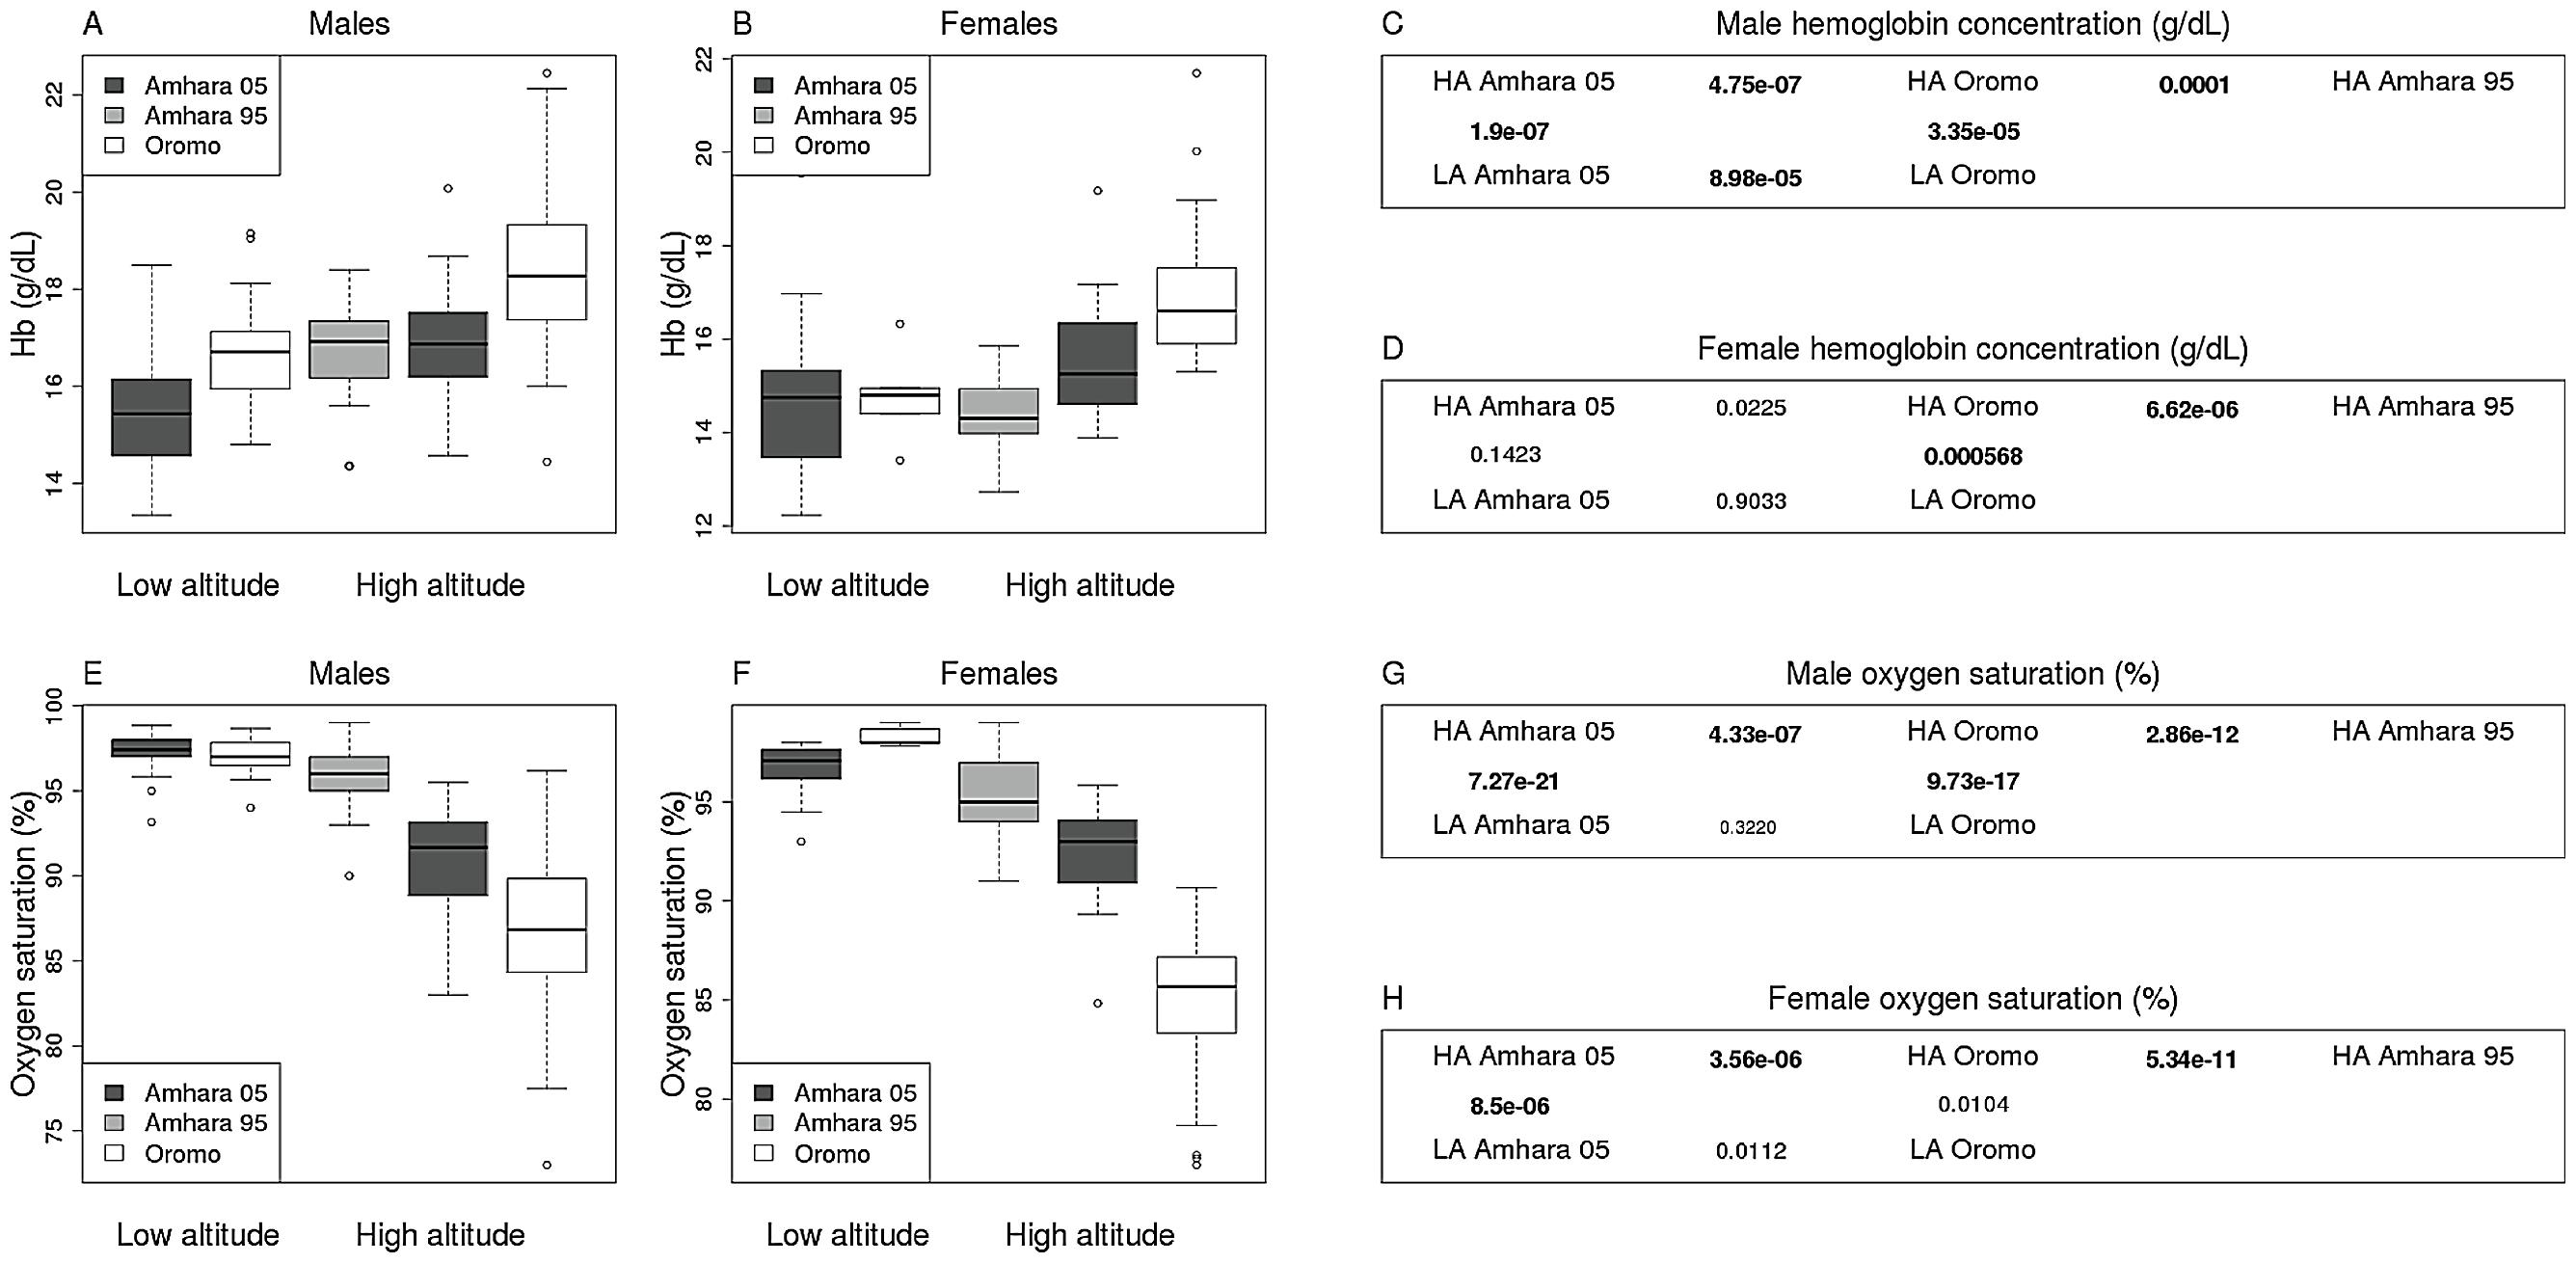 Hemoglobin and oxygen saturation measurements.